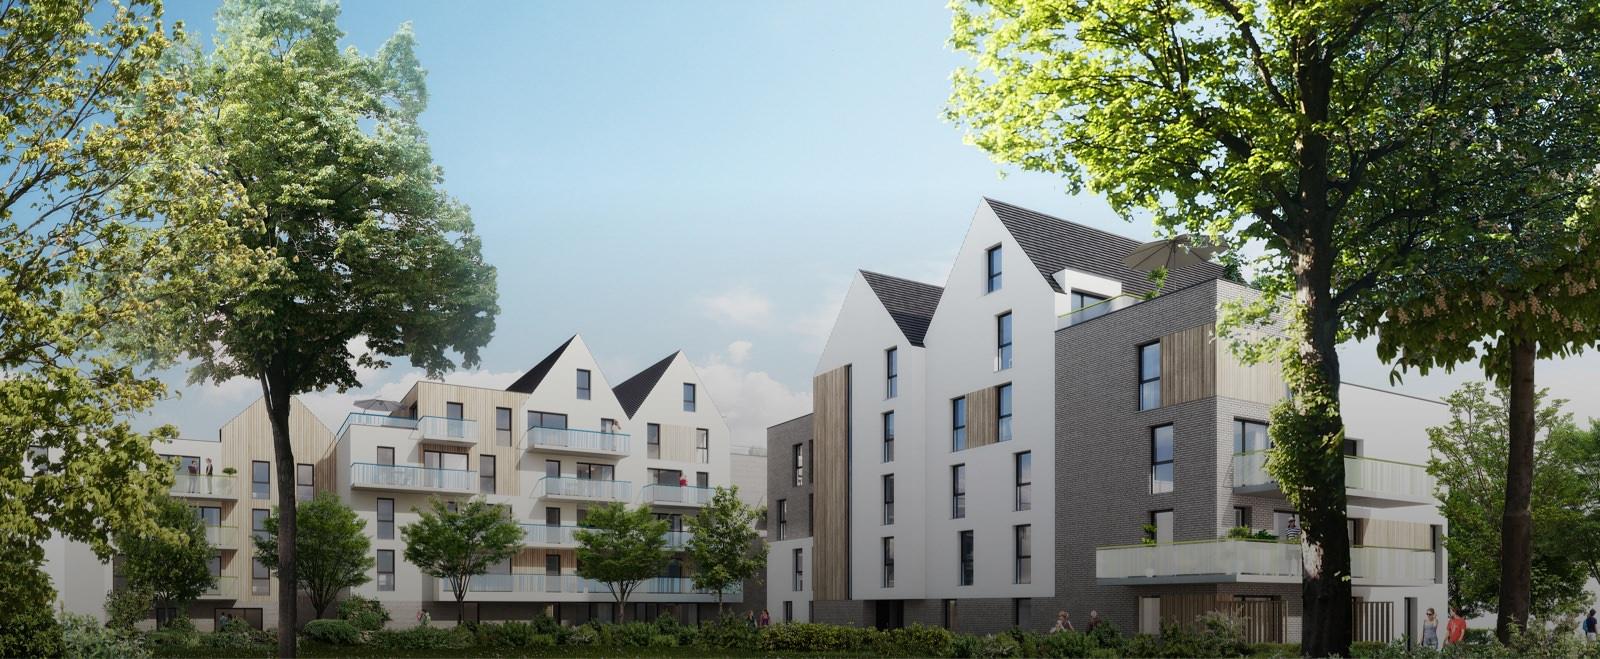 Appartement neuf wimereux carr lafontaine sigla neuf for Achat maison wimereux